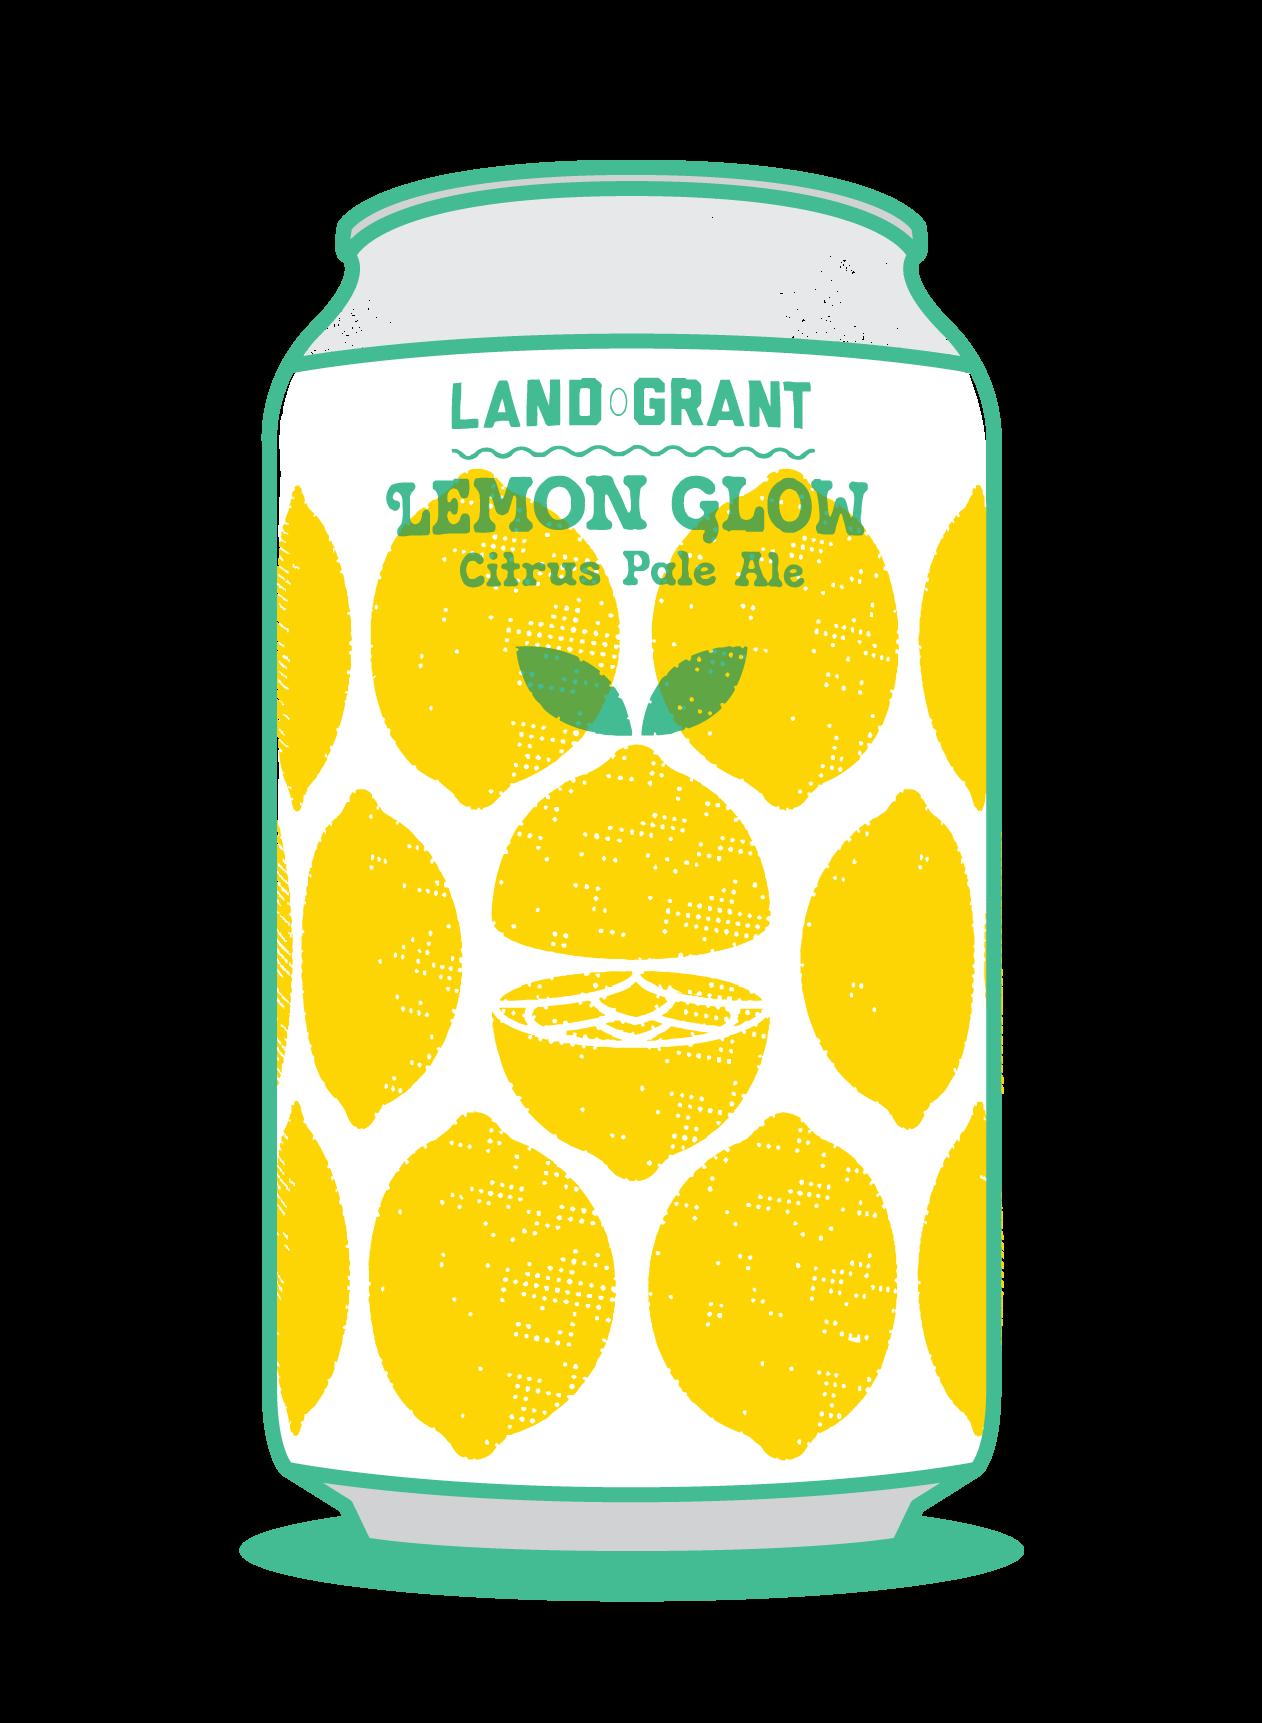 Lemon Glow Image